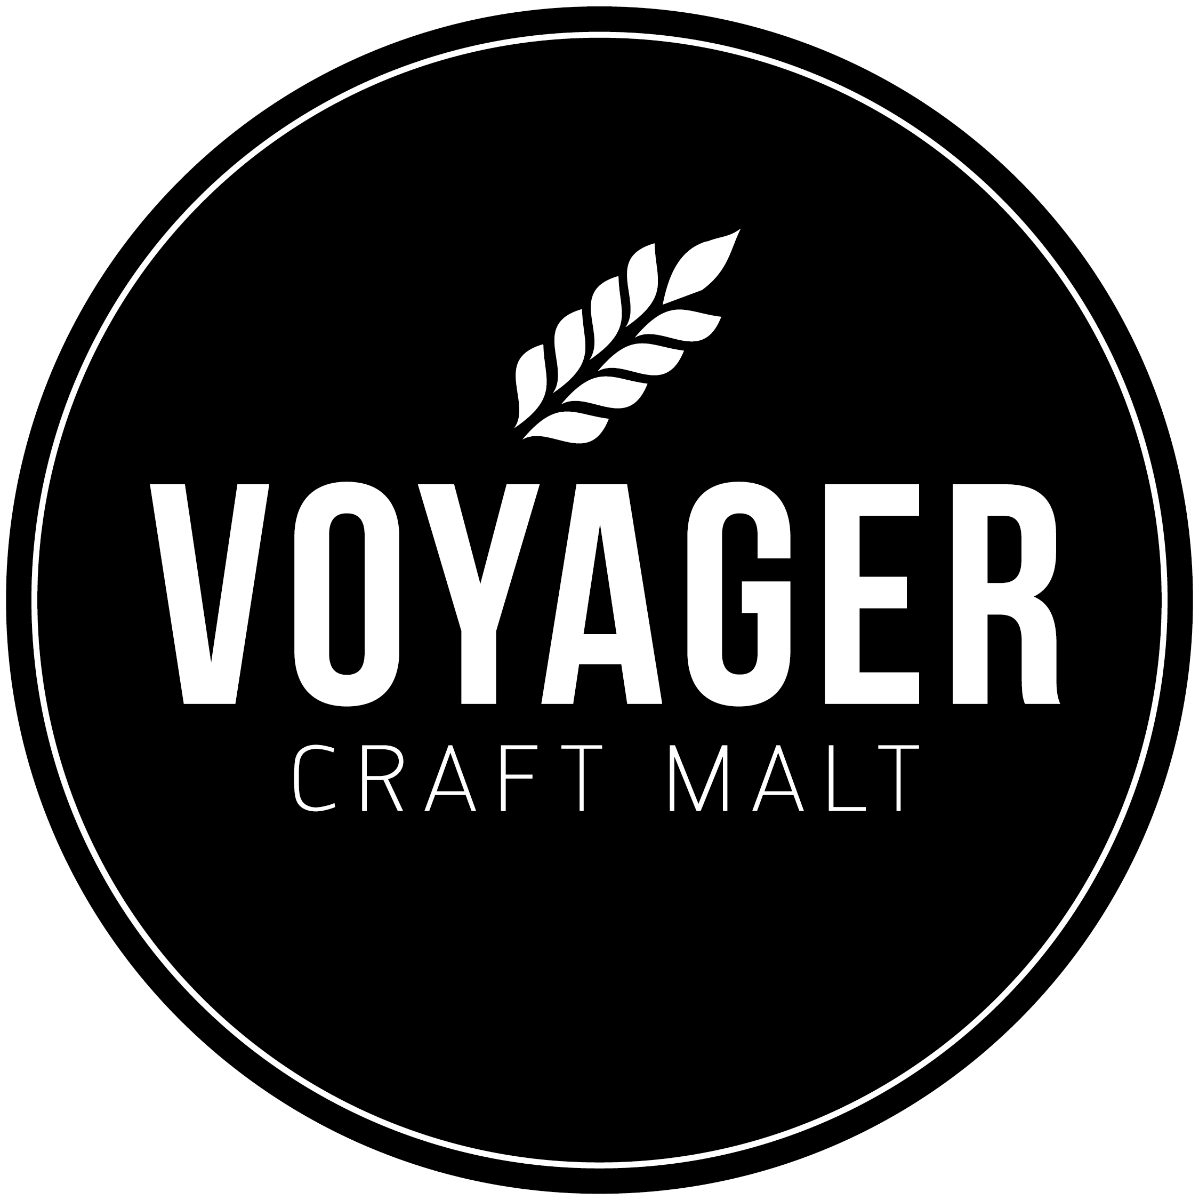 Voyager Voodoo